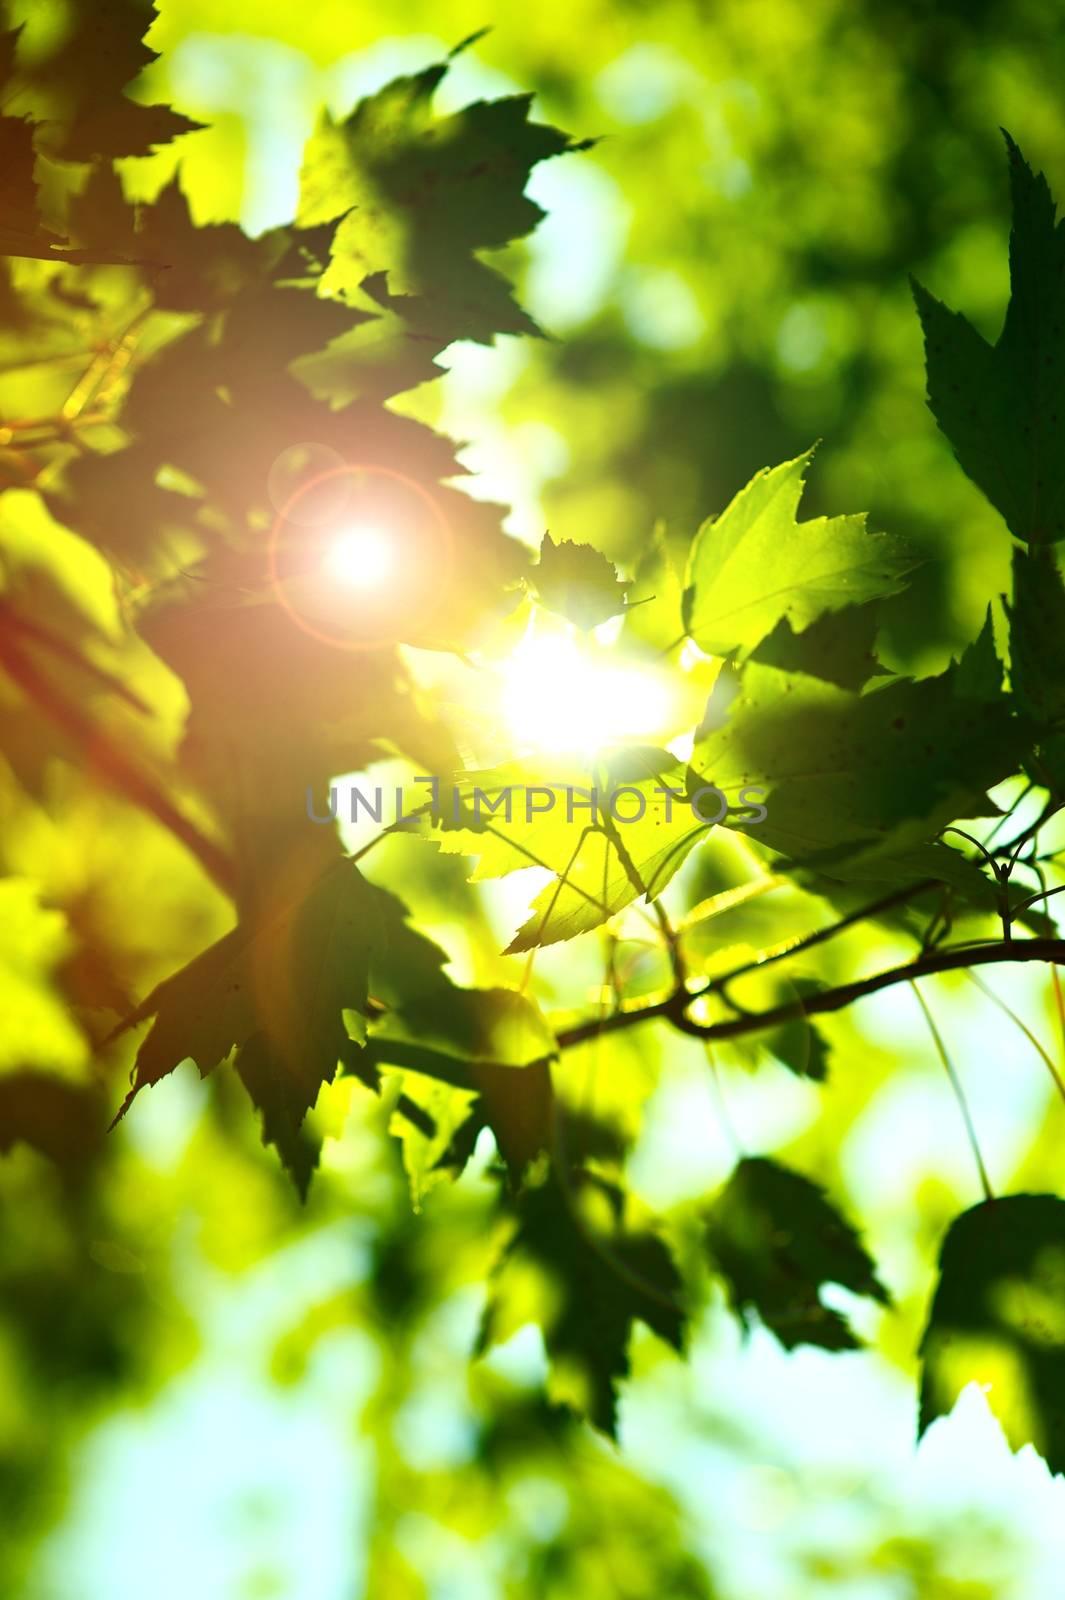 Summer Shine. Sun Rays Between Summer Green Leafes. Vertical Photo Theme.